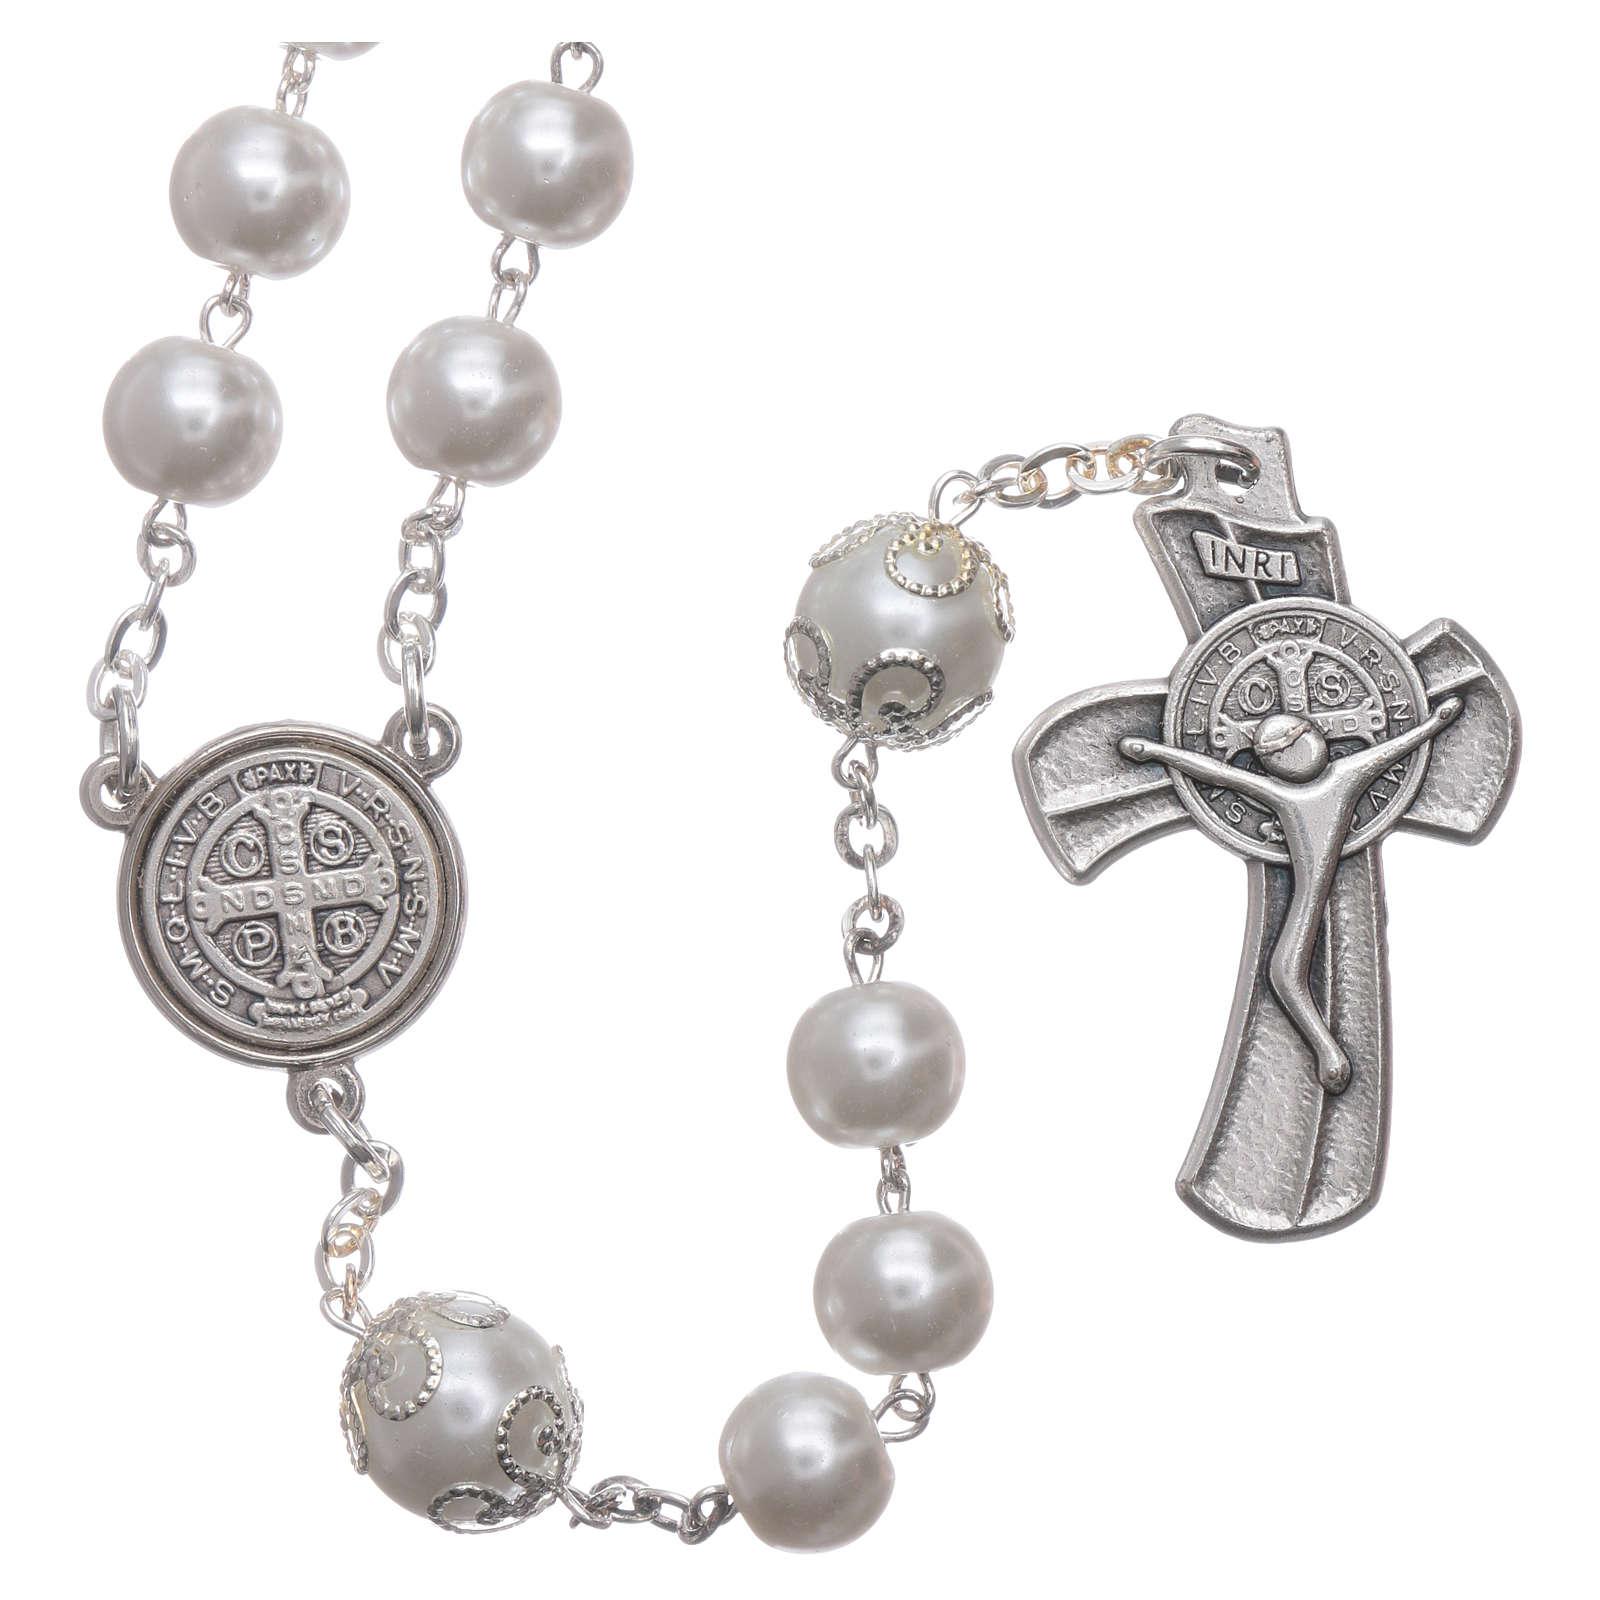 Medjugorje rosary in pearl imitation Saint Benedict 8 mm 4